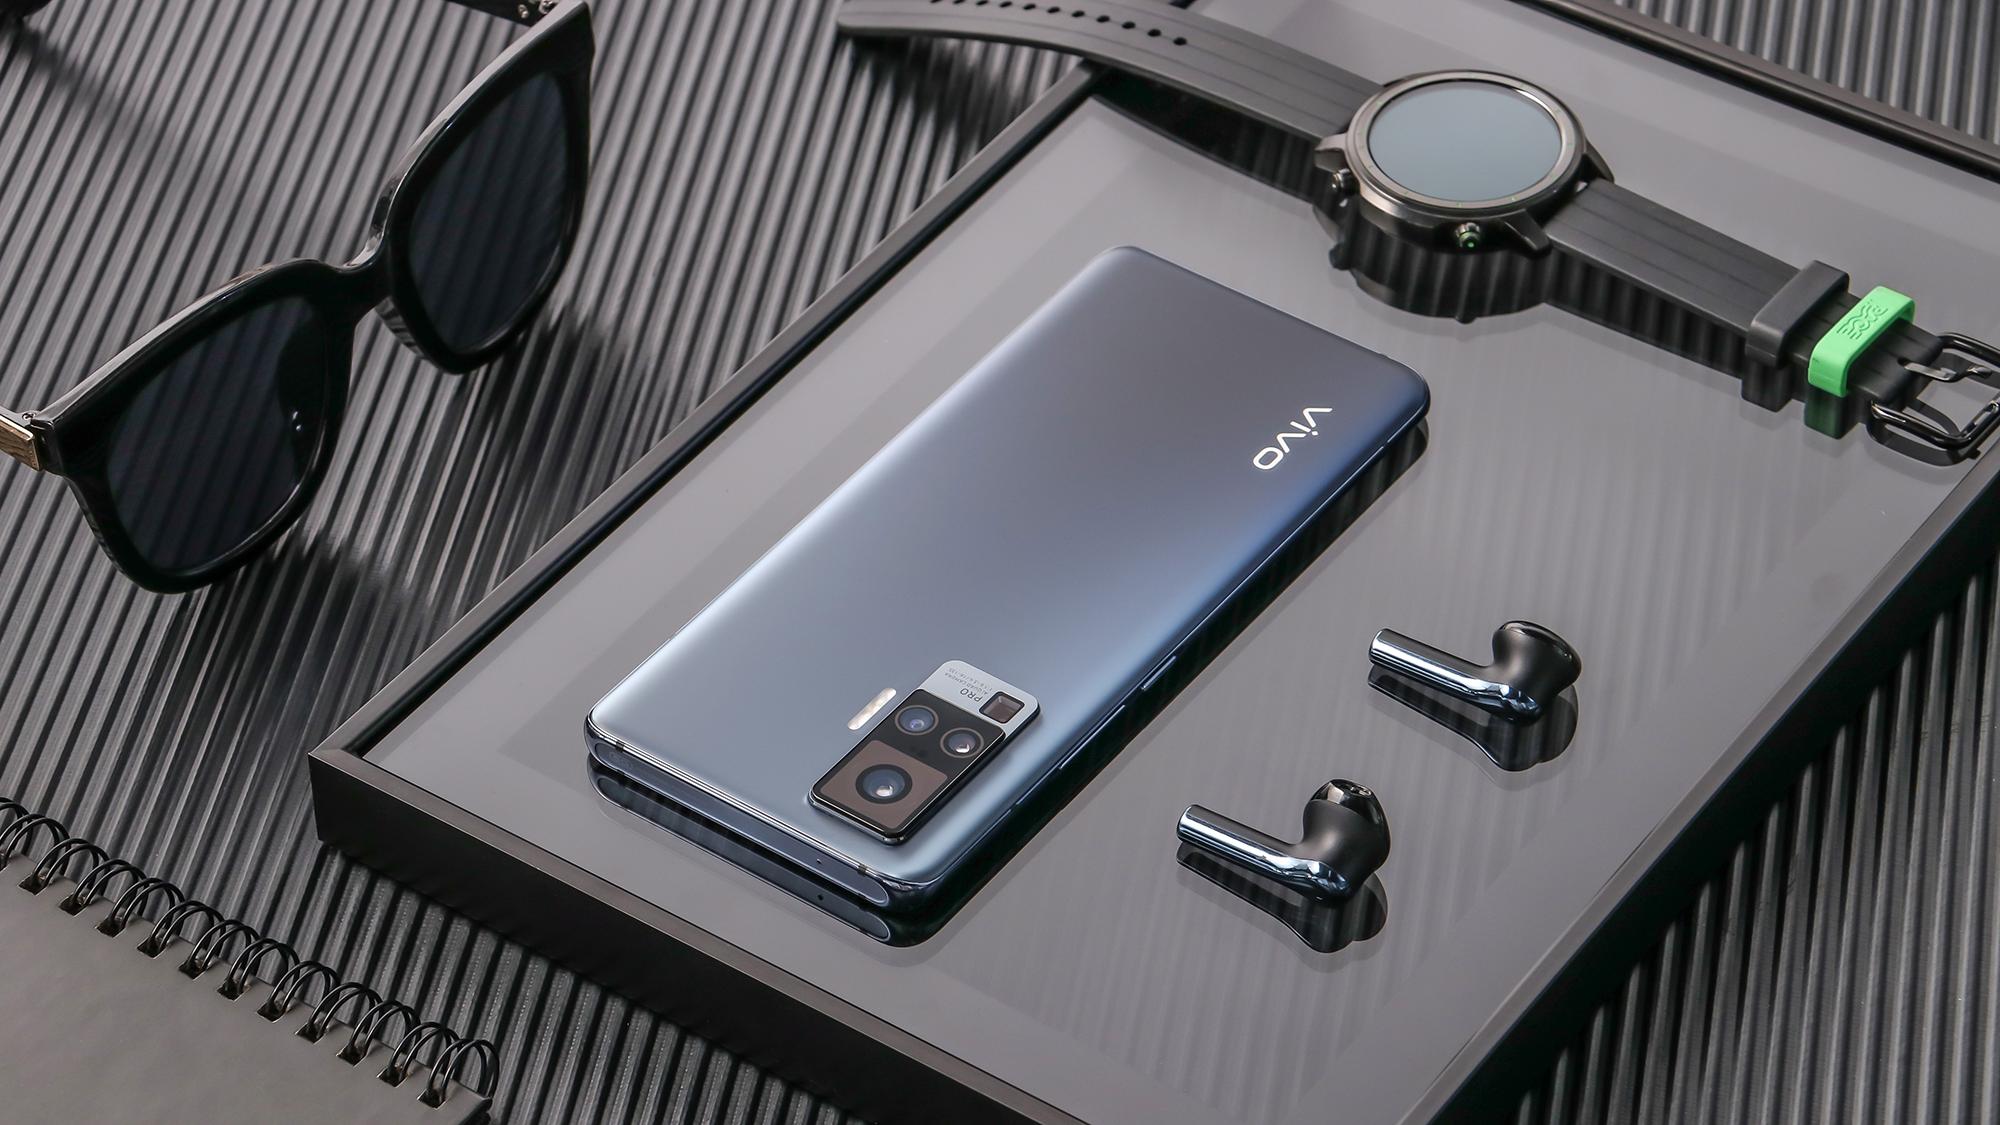 Vivo X50, X50 Pro launching in India soon